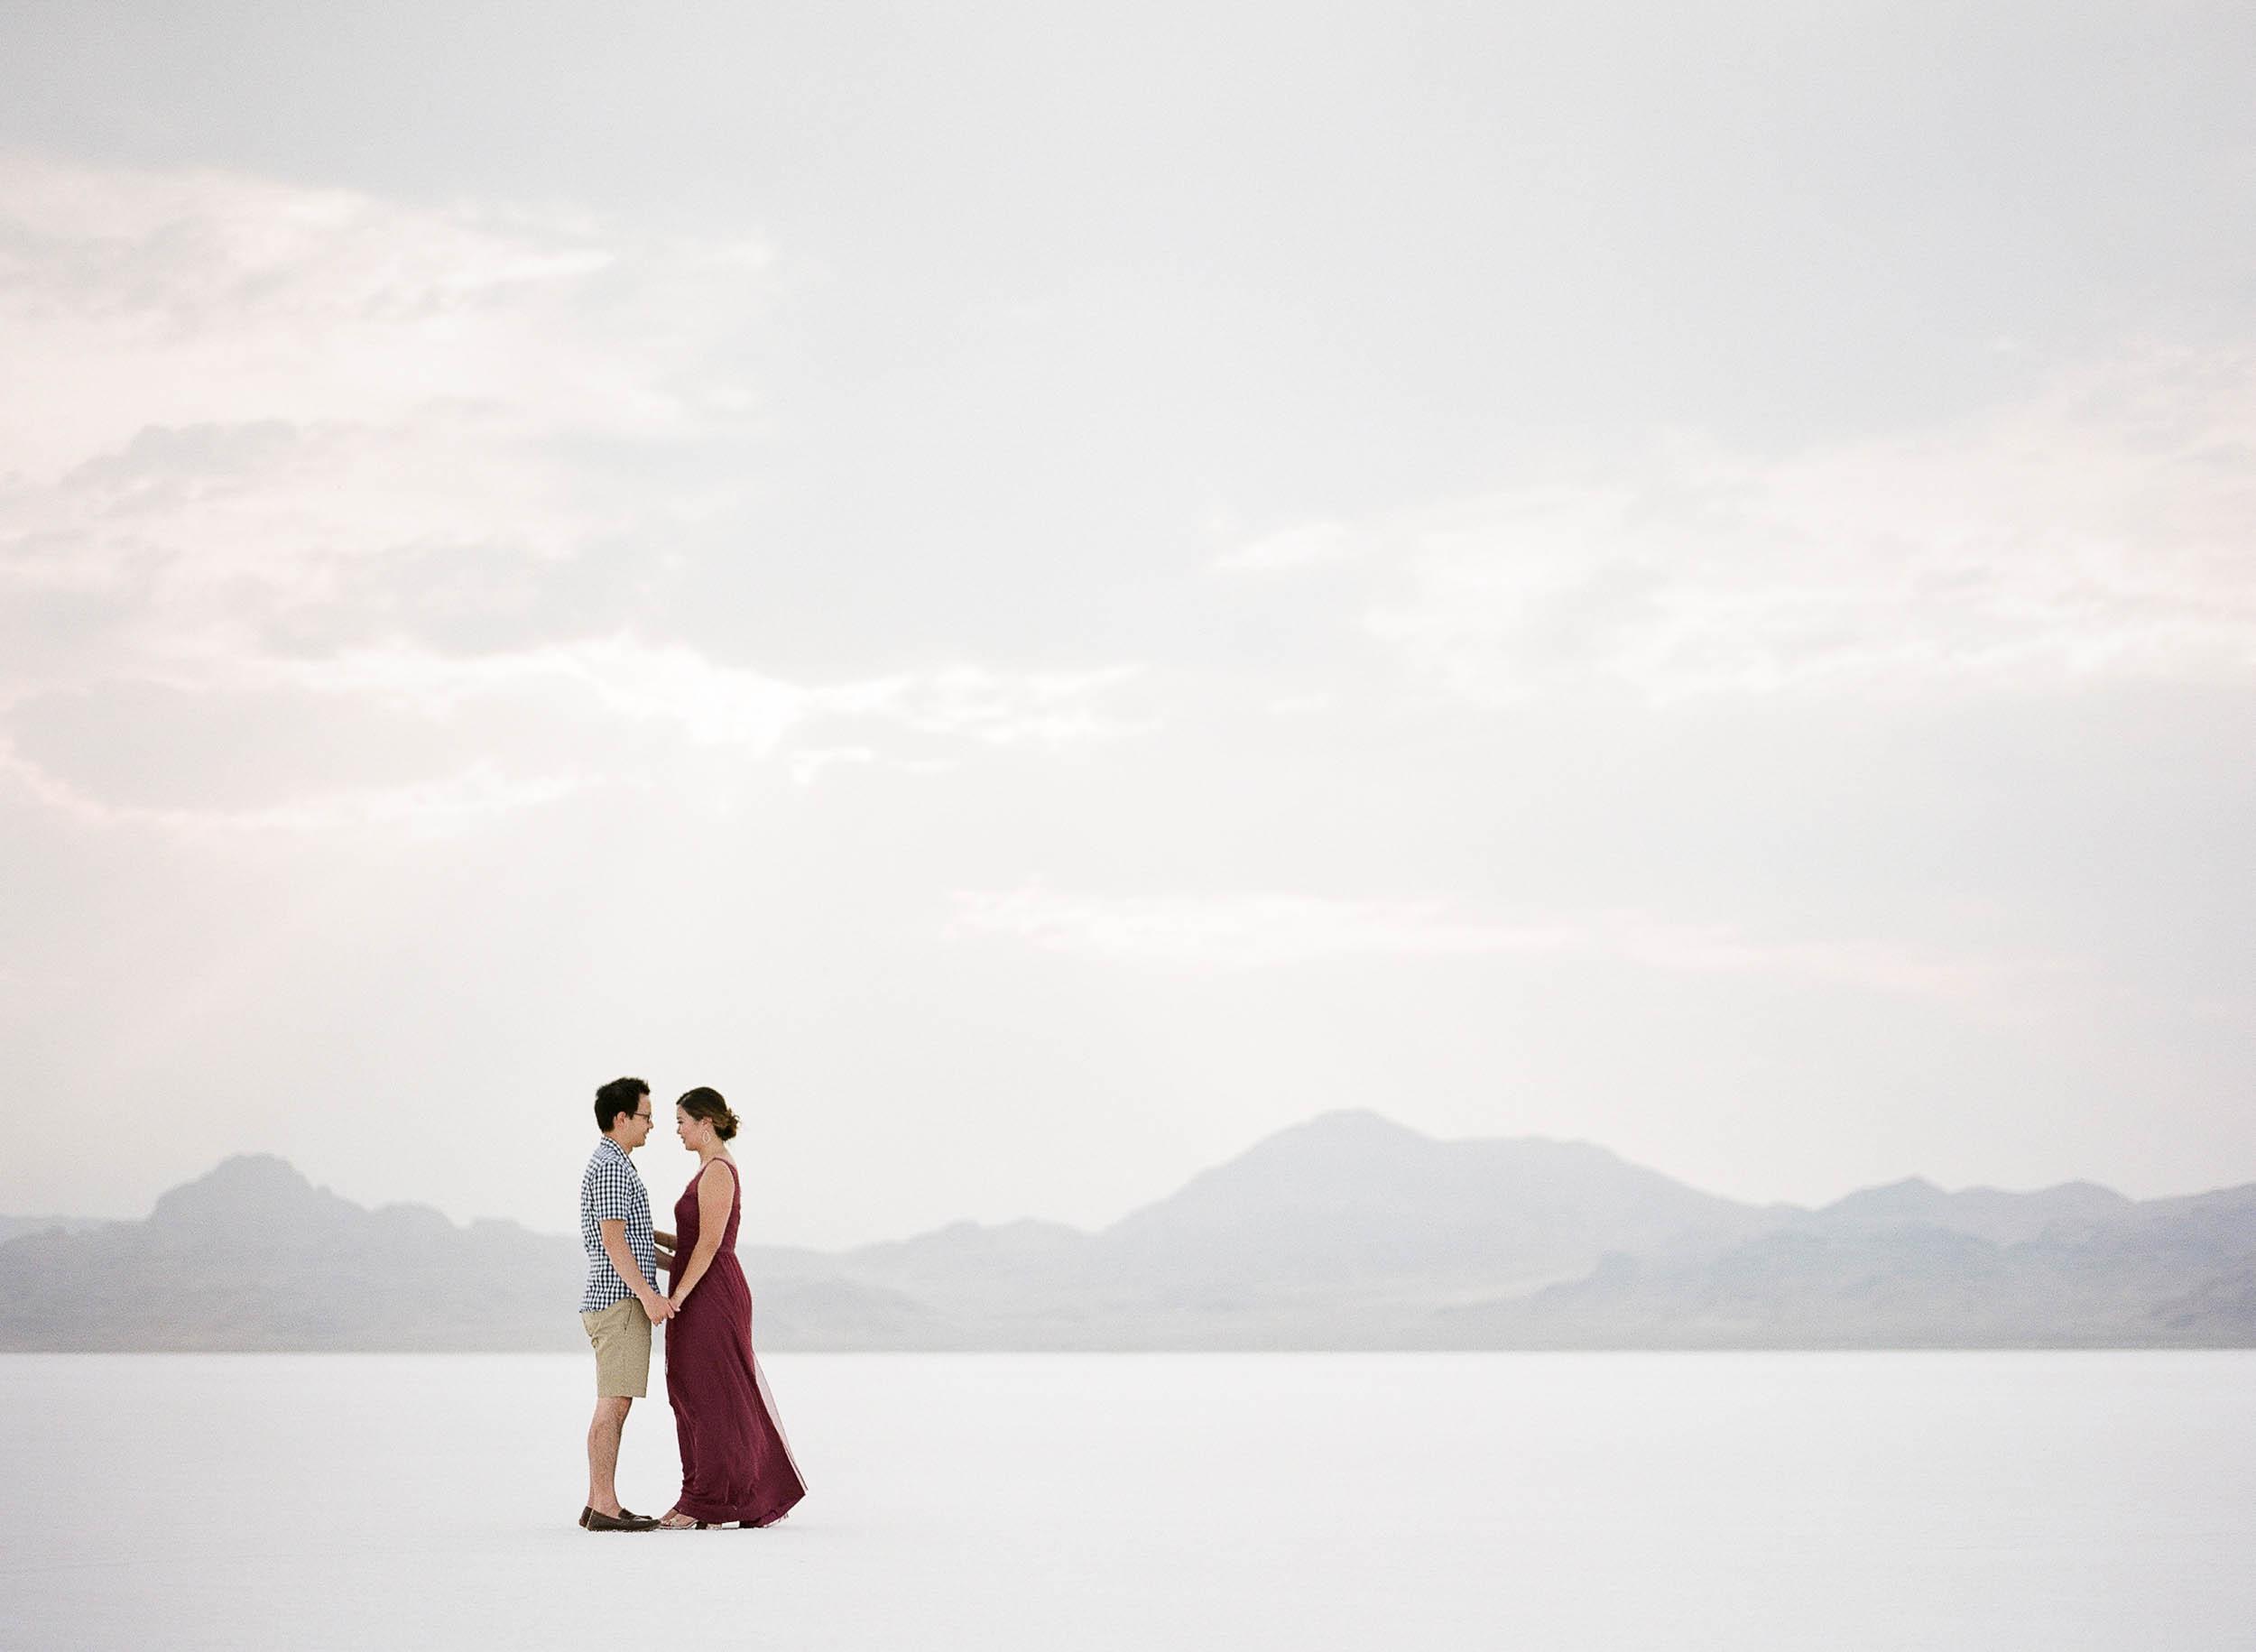 070918_Sandy A La Mode_Family_Utah Salt Flats_Buena Lane Photography_F400_45.jpg